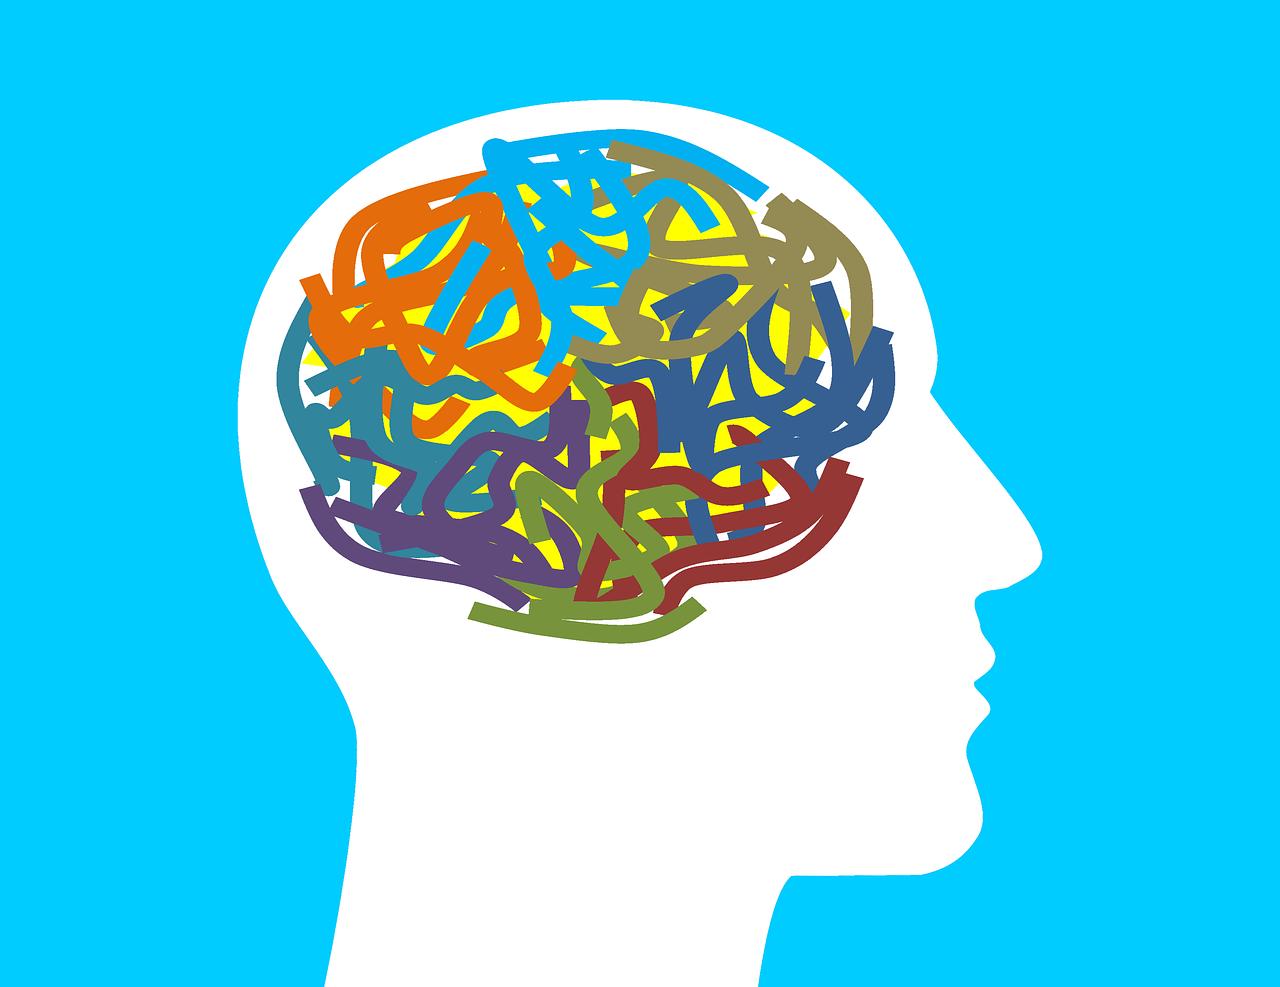 Mental Health Brain Mind - Free image on Pixabay